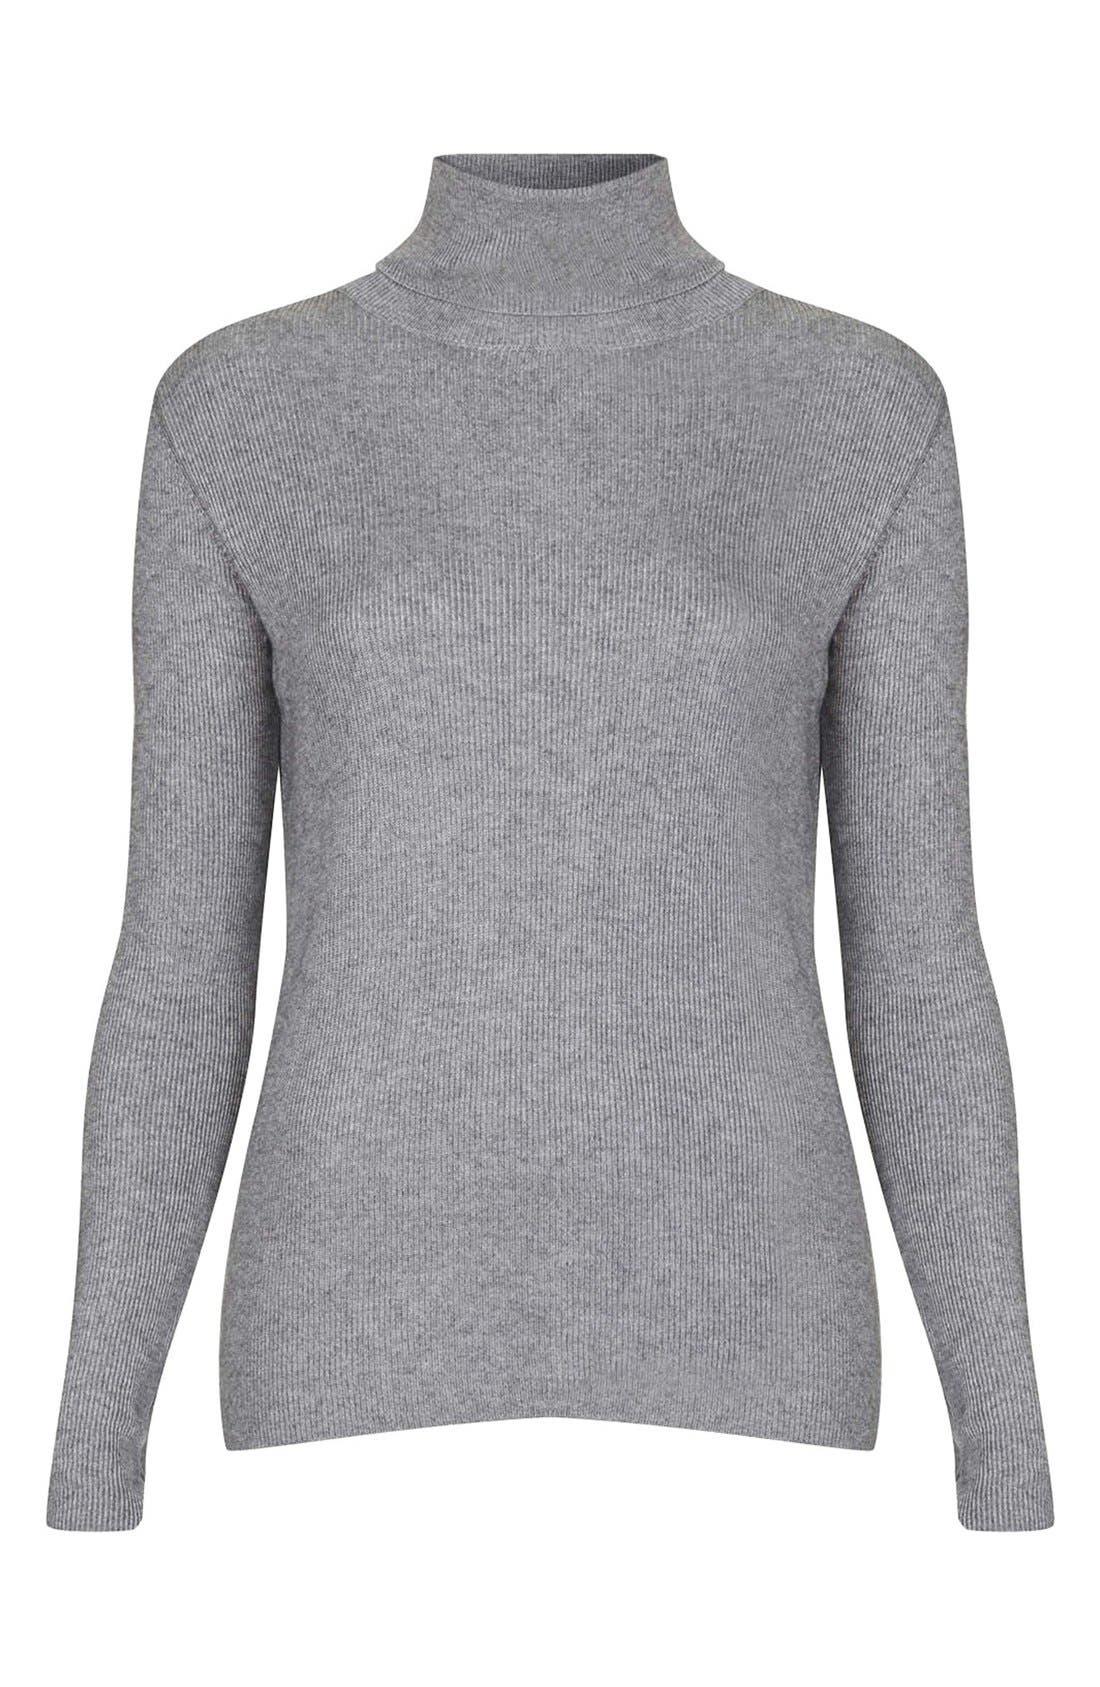 Alternate Image 1 Selected - Topshop Ribbed Turtleneck Sweater